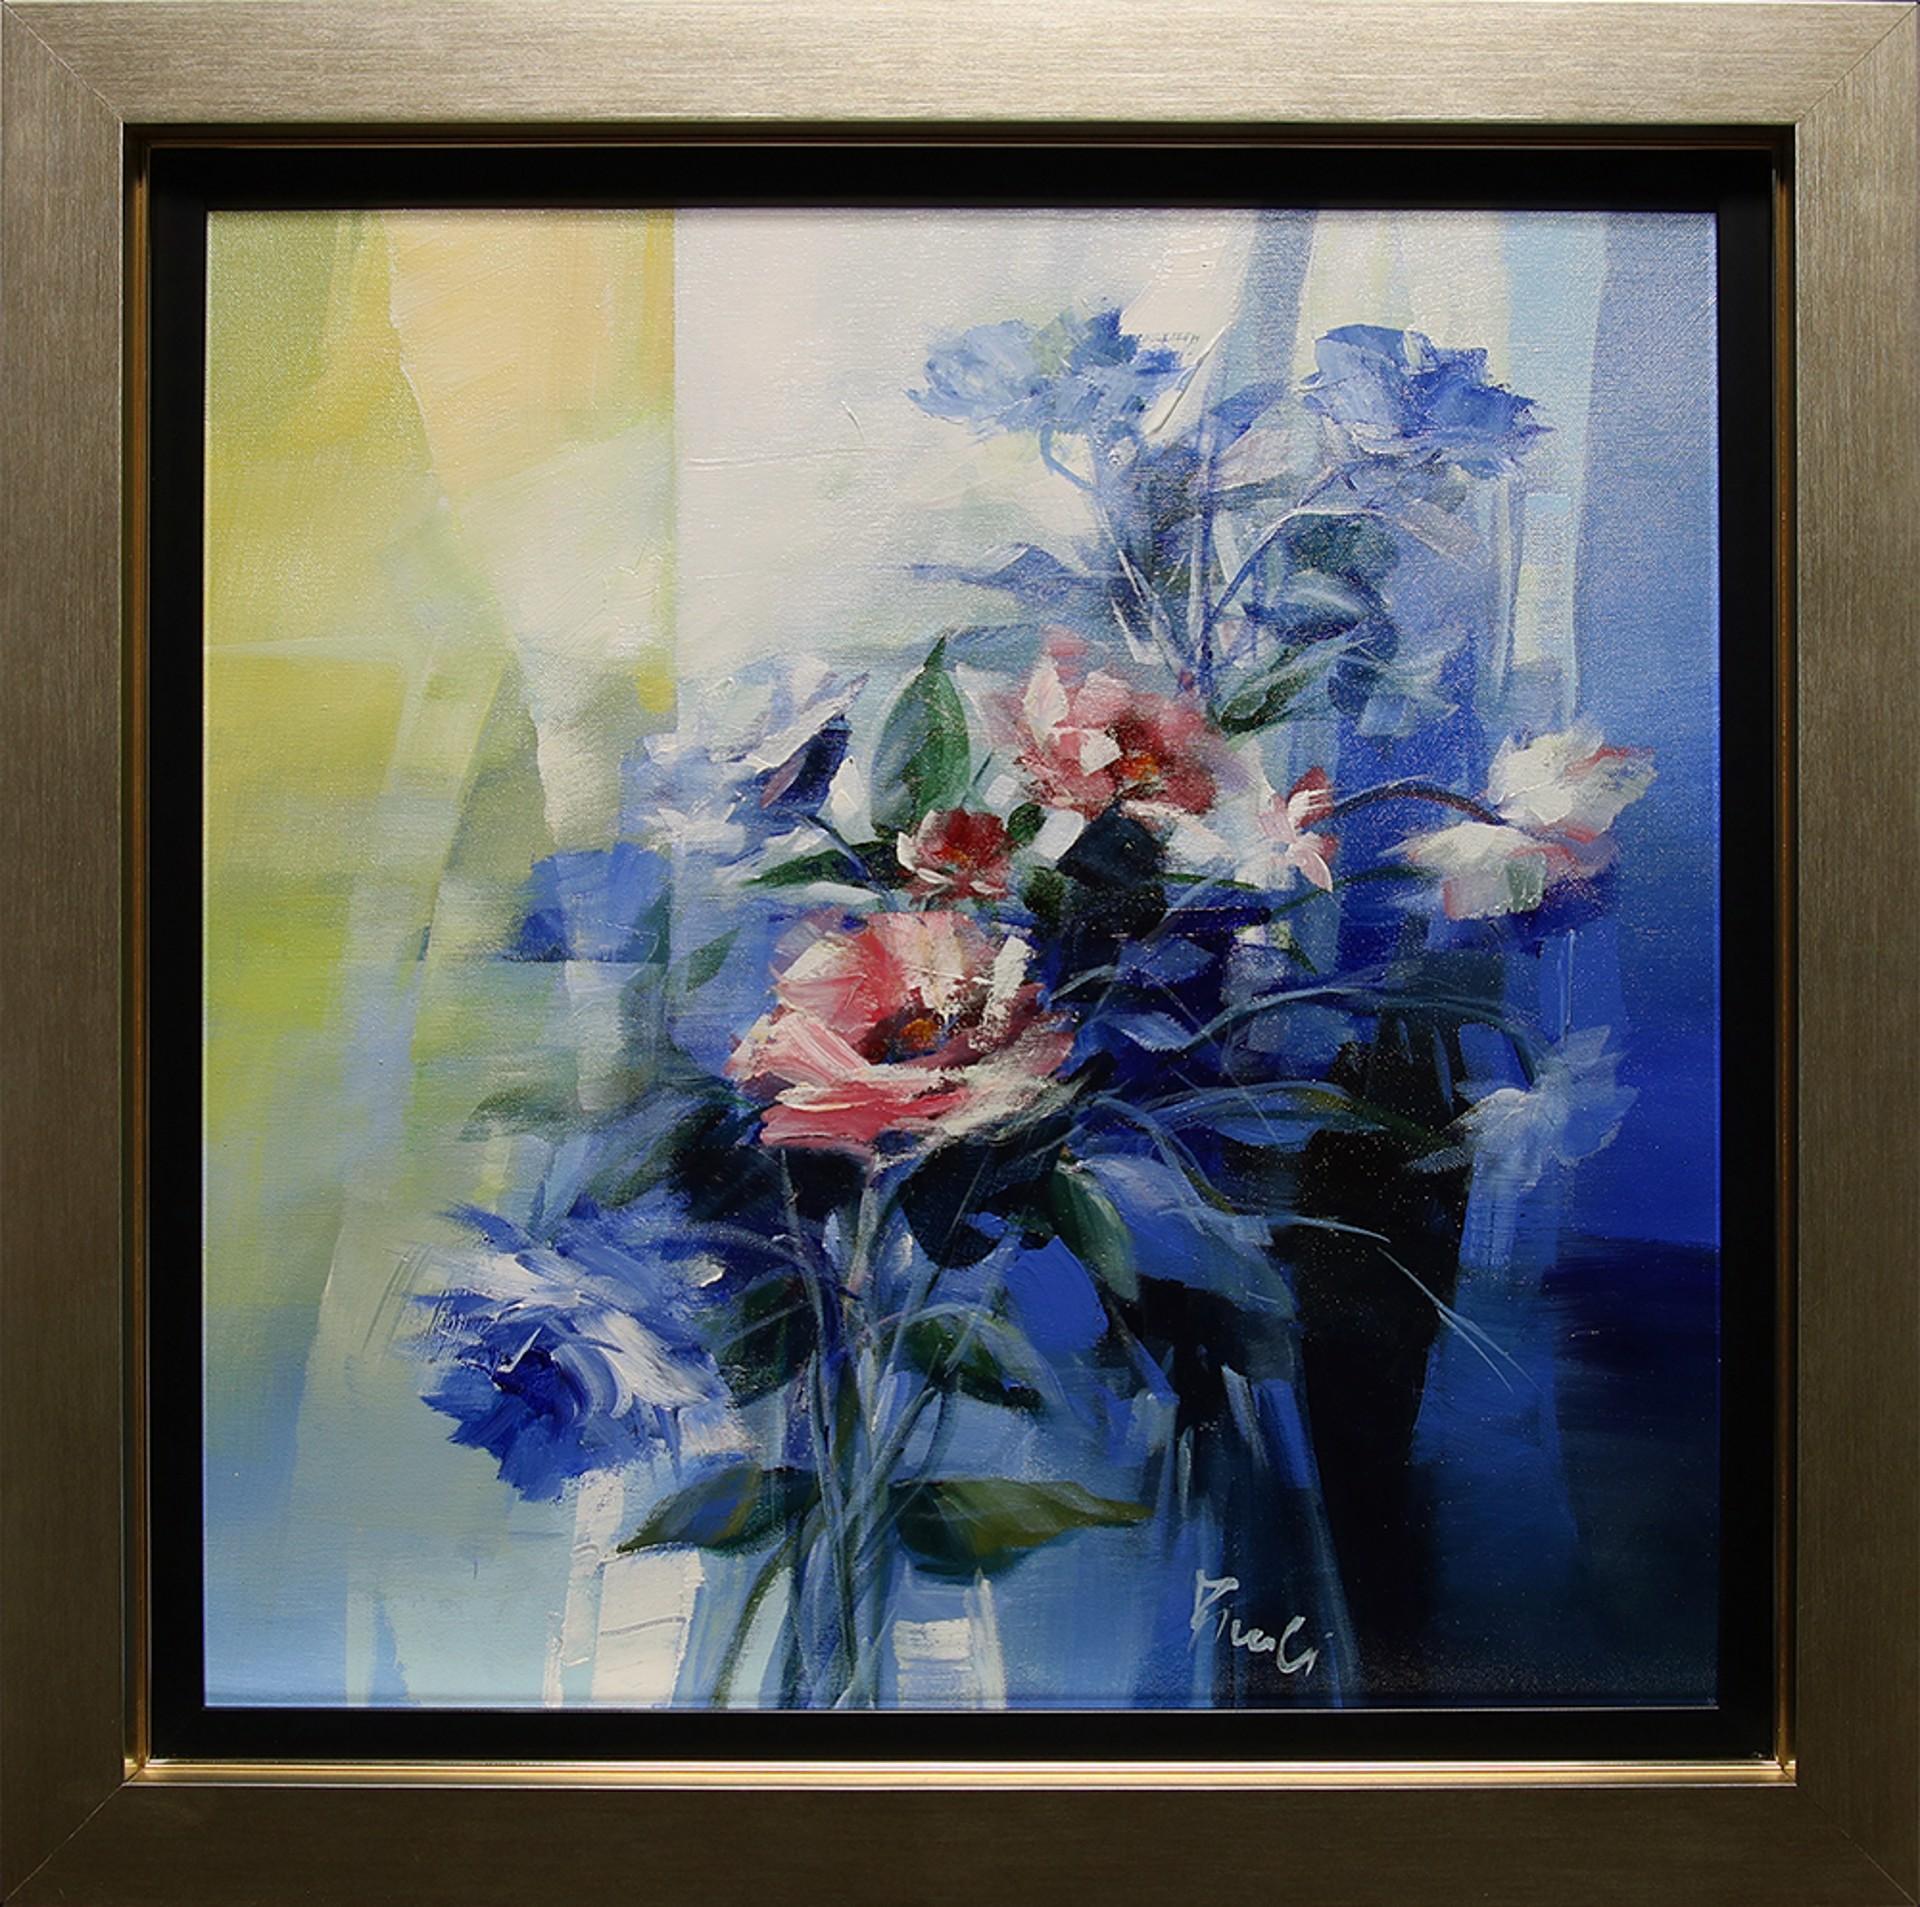 Luce Blue by Pietro Piccoli